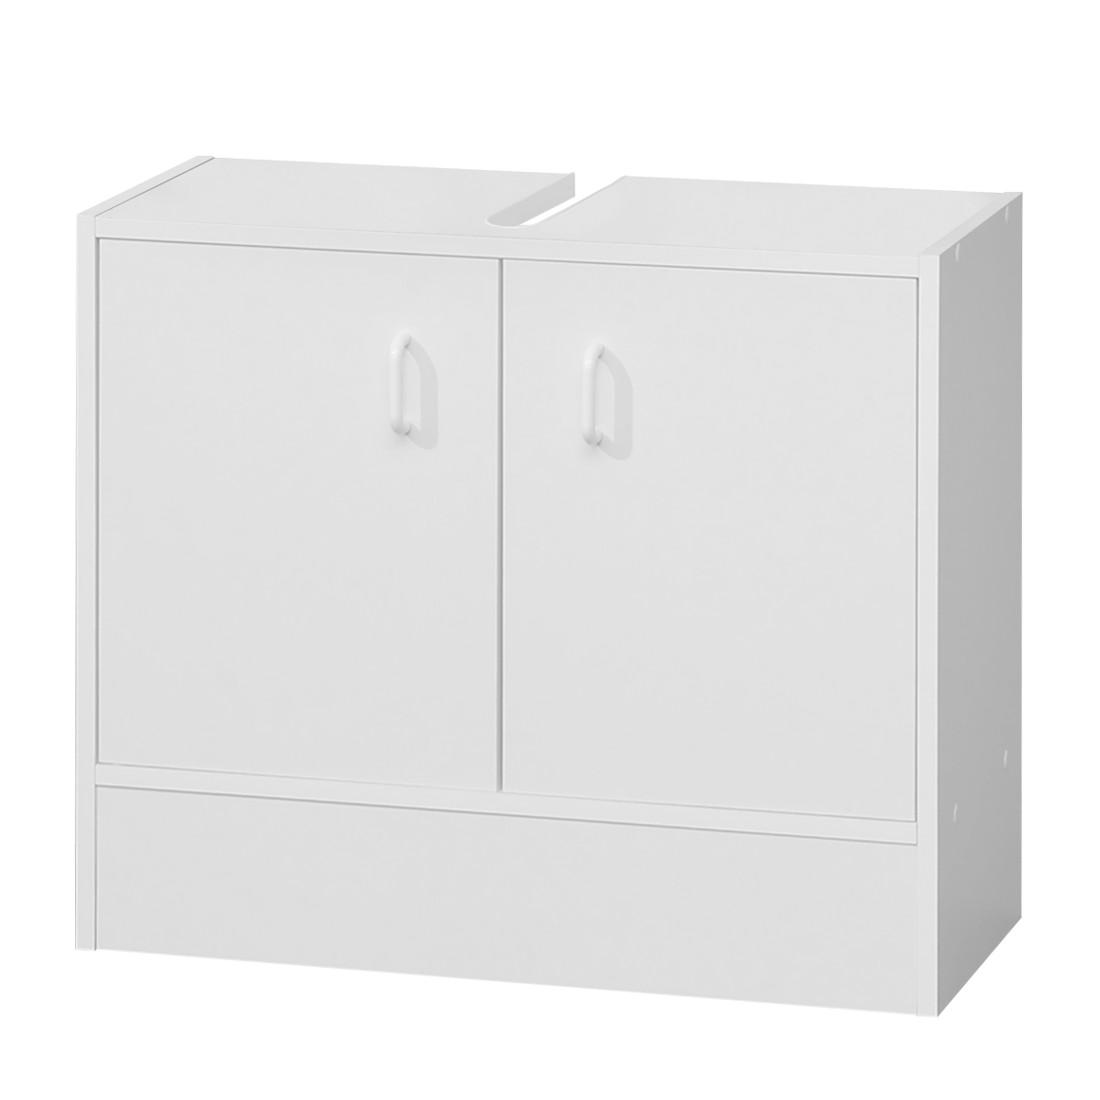 Armadietto da lavabo Cuneo - Bianco, Kesper Badmöbel